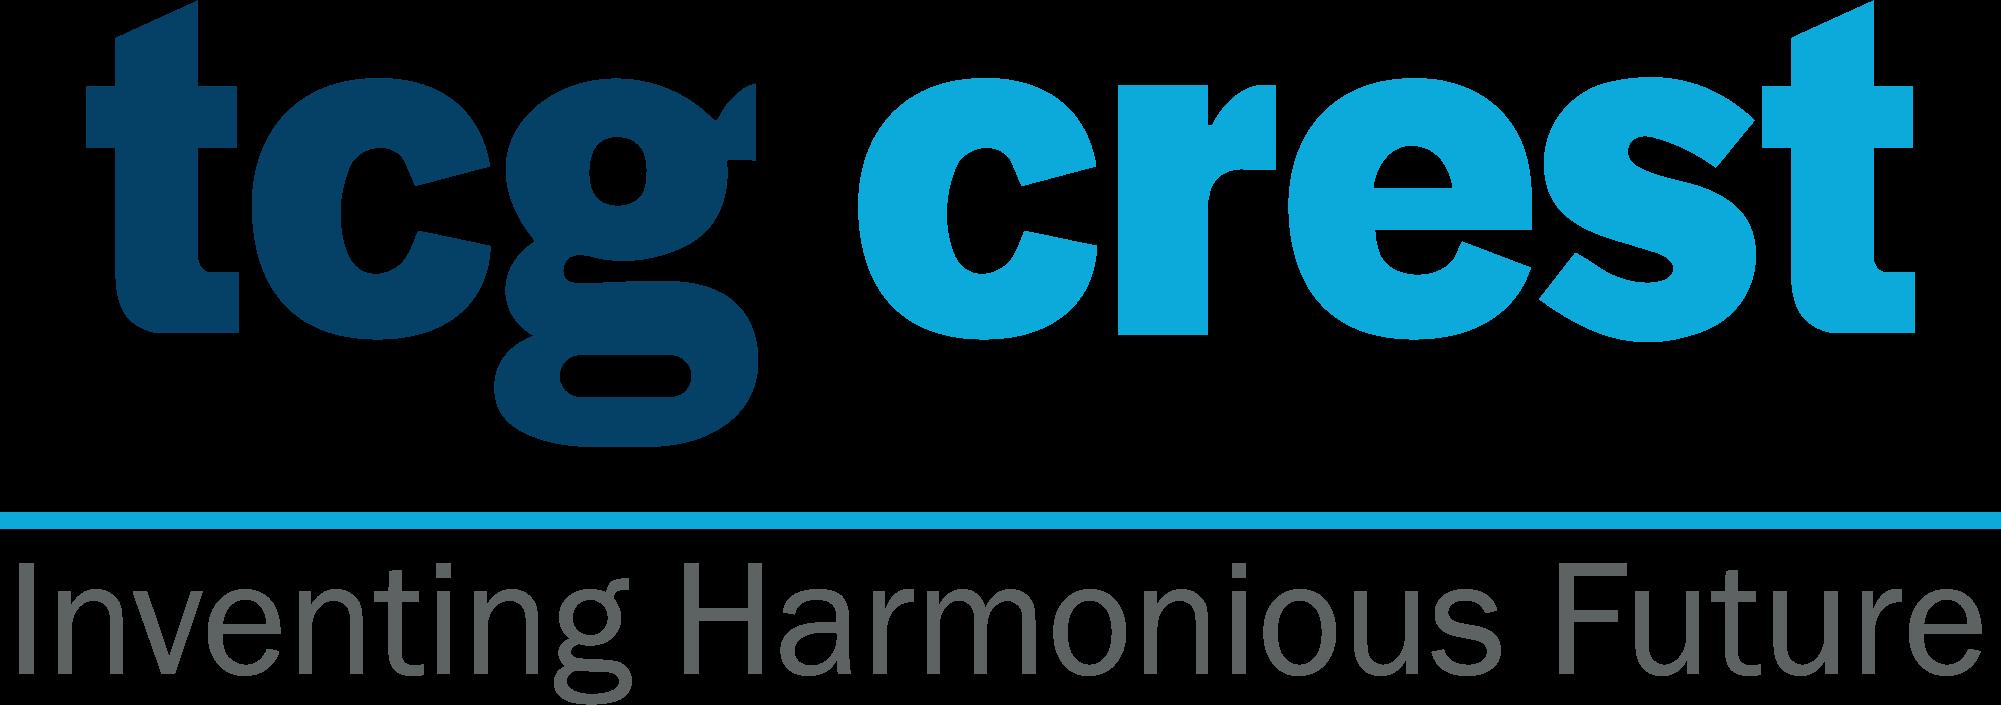 TCG Crest